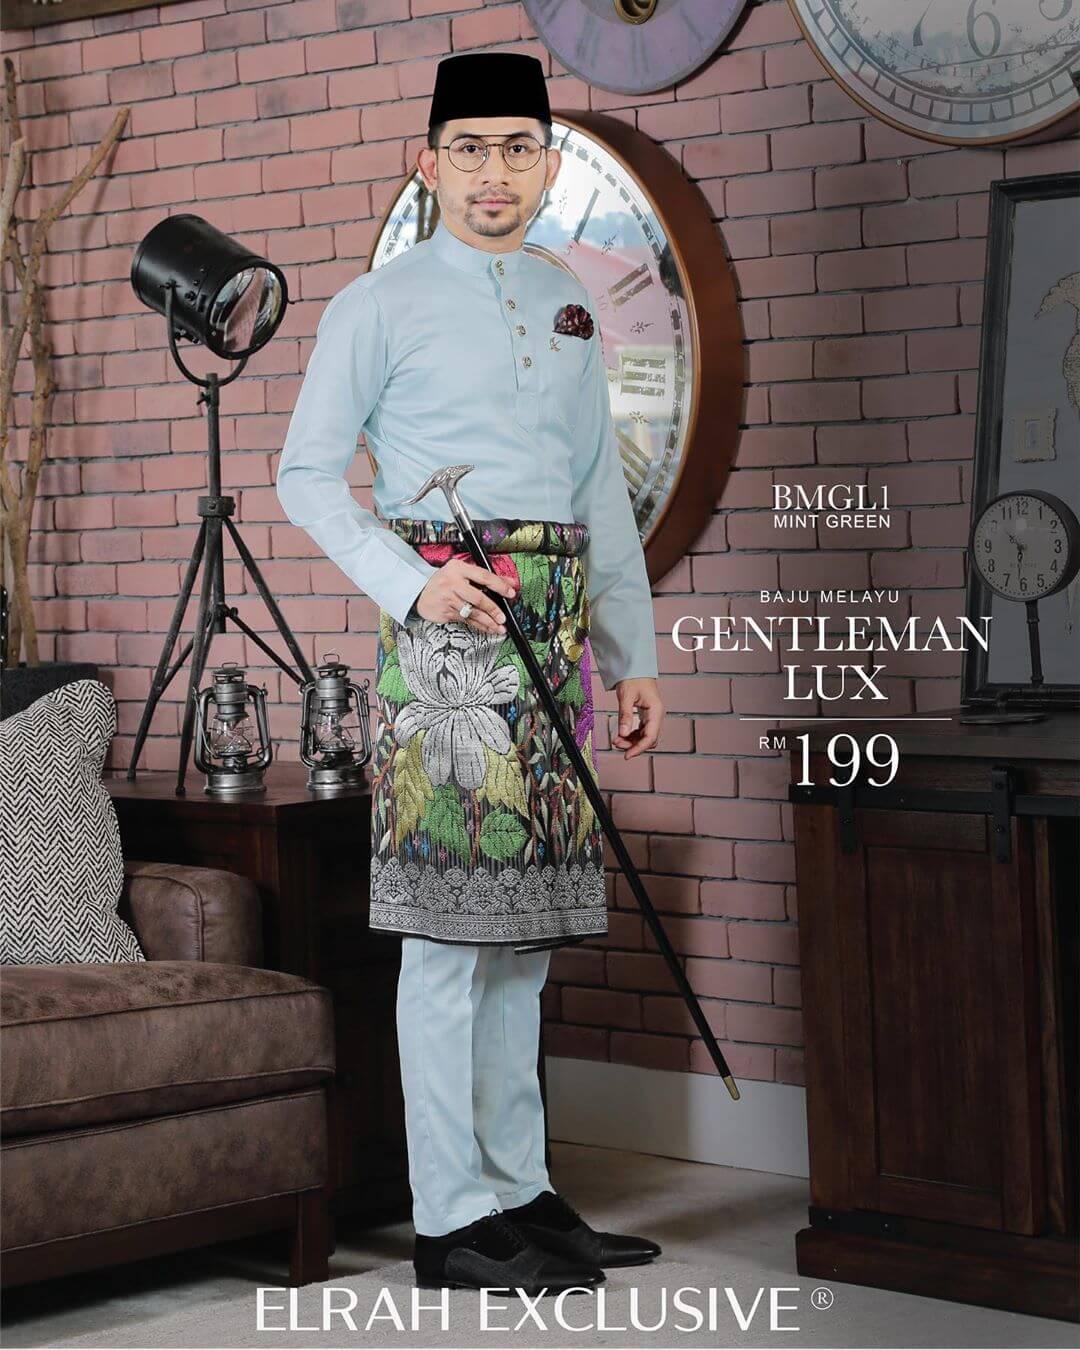 Baju Melayu Gentleman Lux Mint Green